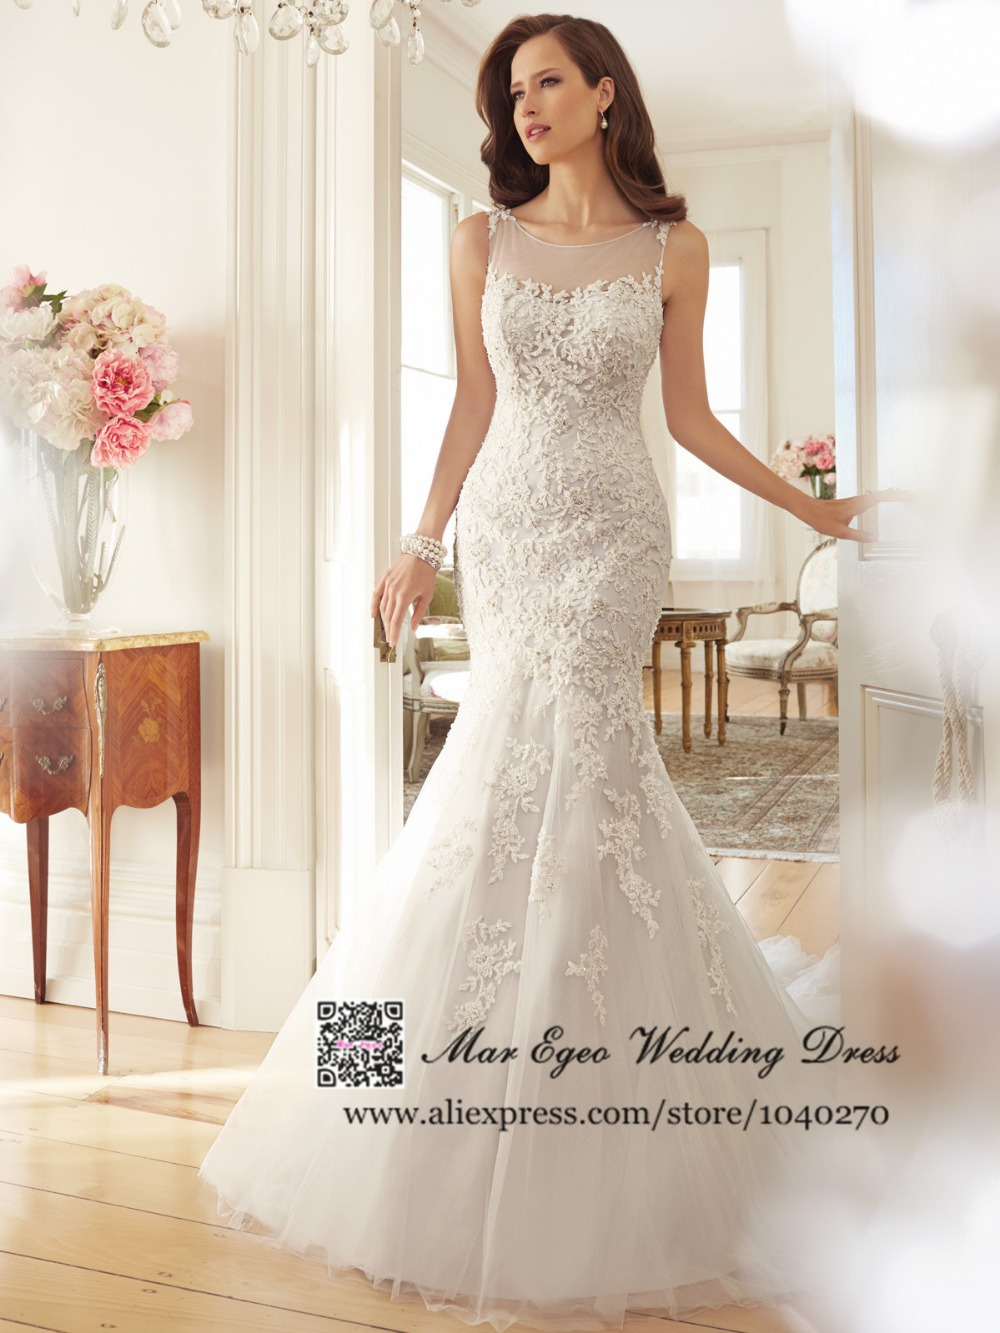 new wedding dress 77 lace top wedding dress Summer Chiffon Wedding Dresses Lace Top Short Sleeves Side Slit Garden Elegant Bridal Gowns